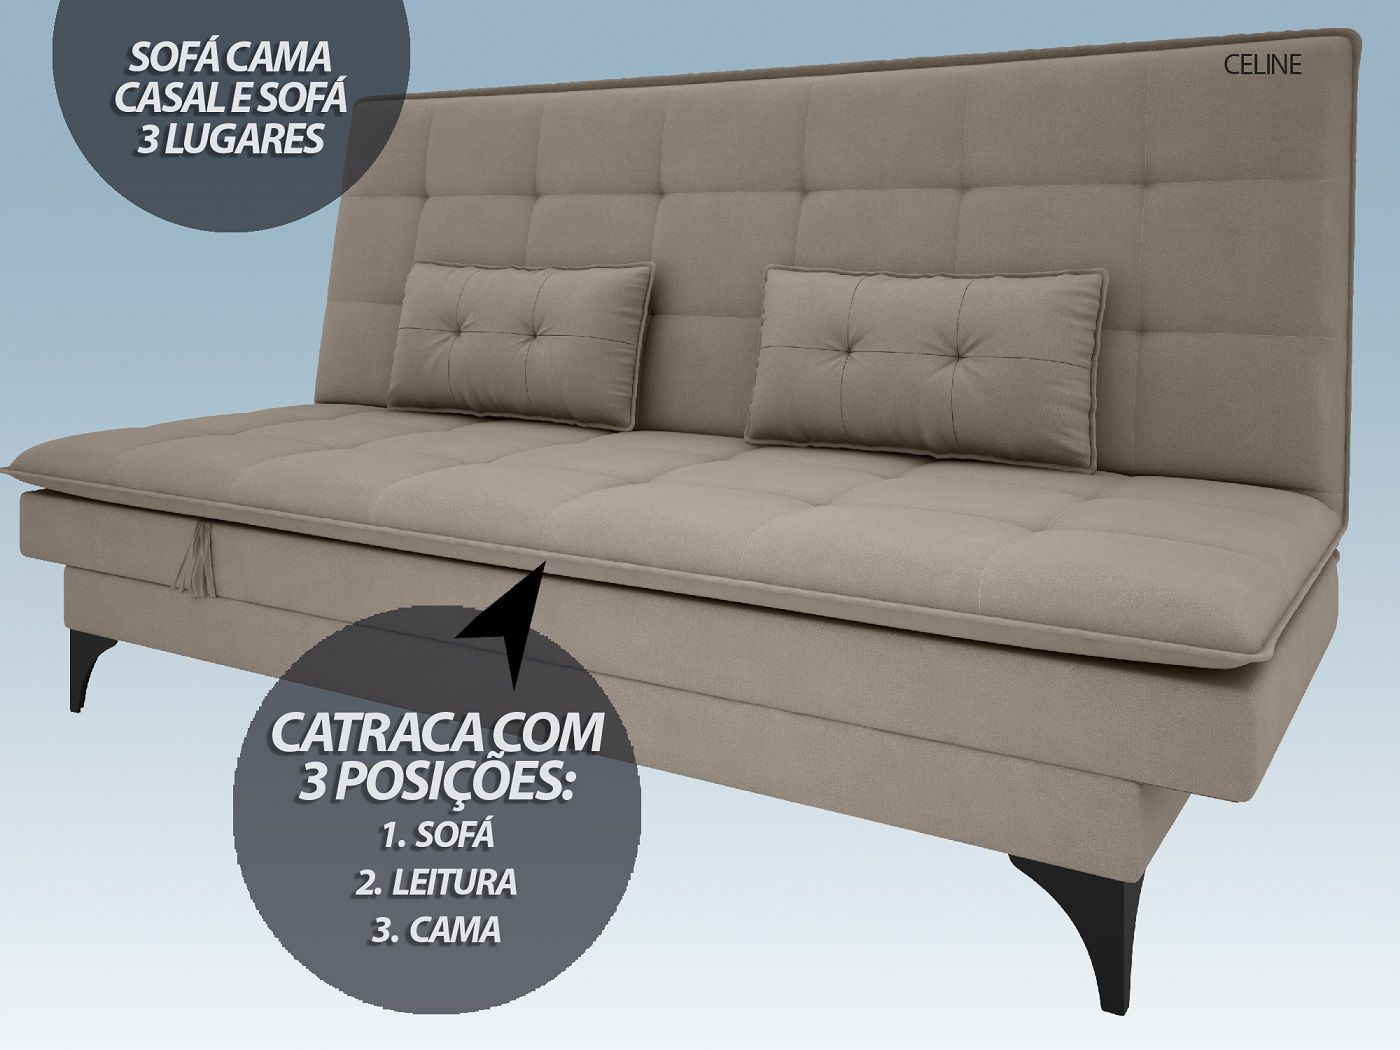 Sofá-Cama Casal New Celine 1,94m Velosuede Bege - NETSOFAS  - NETSOFÁS